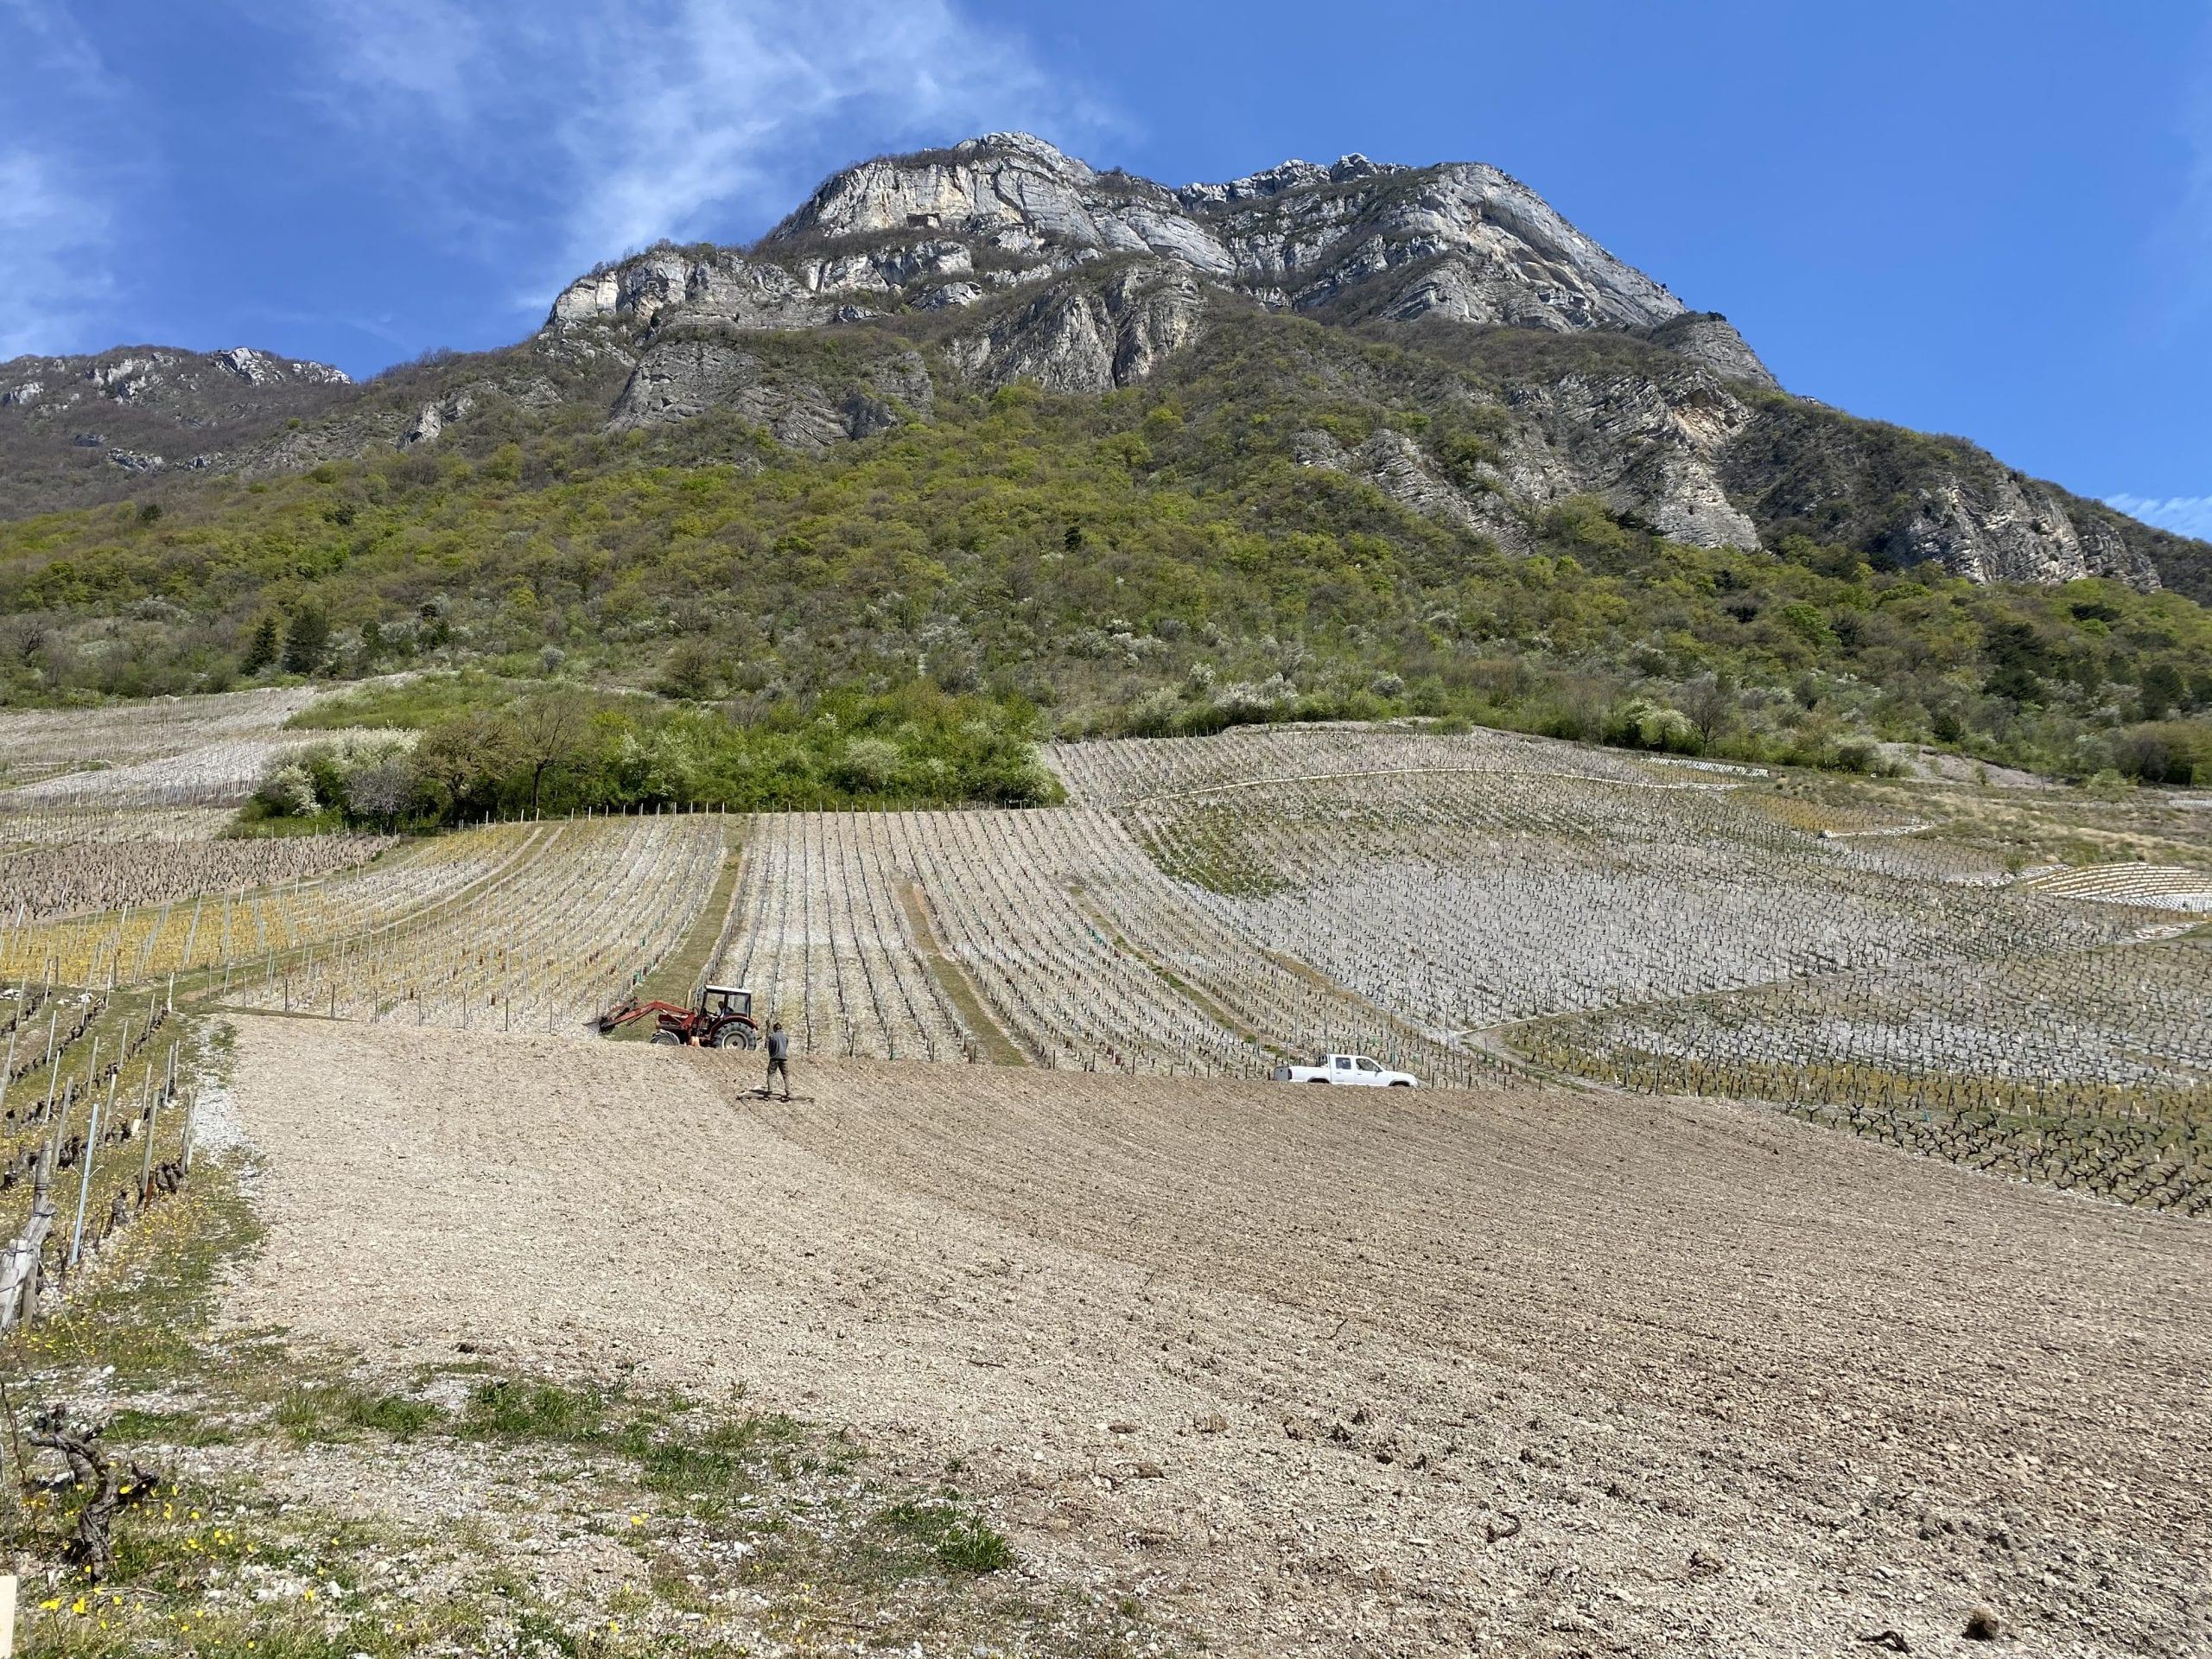 SAVOYARDE PLANTATION PETITE ARVINE CHIGNIN COTEAU DE TORMERY